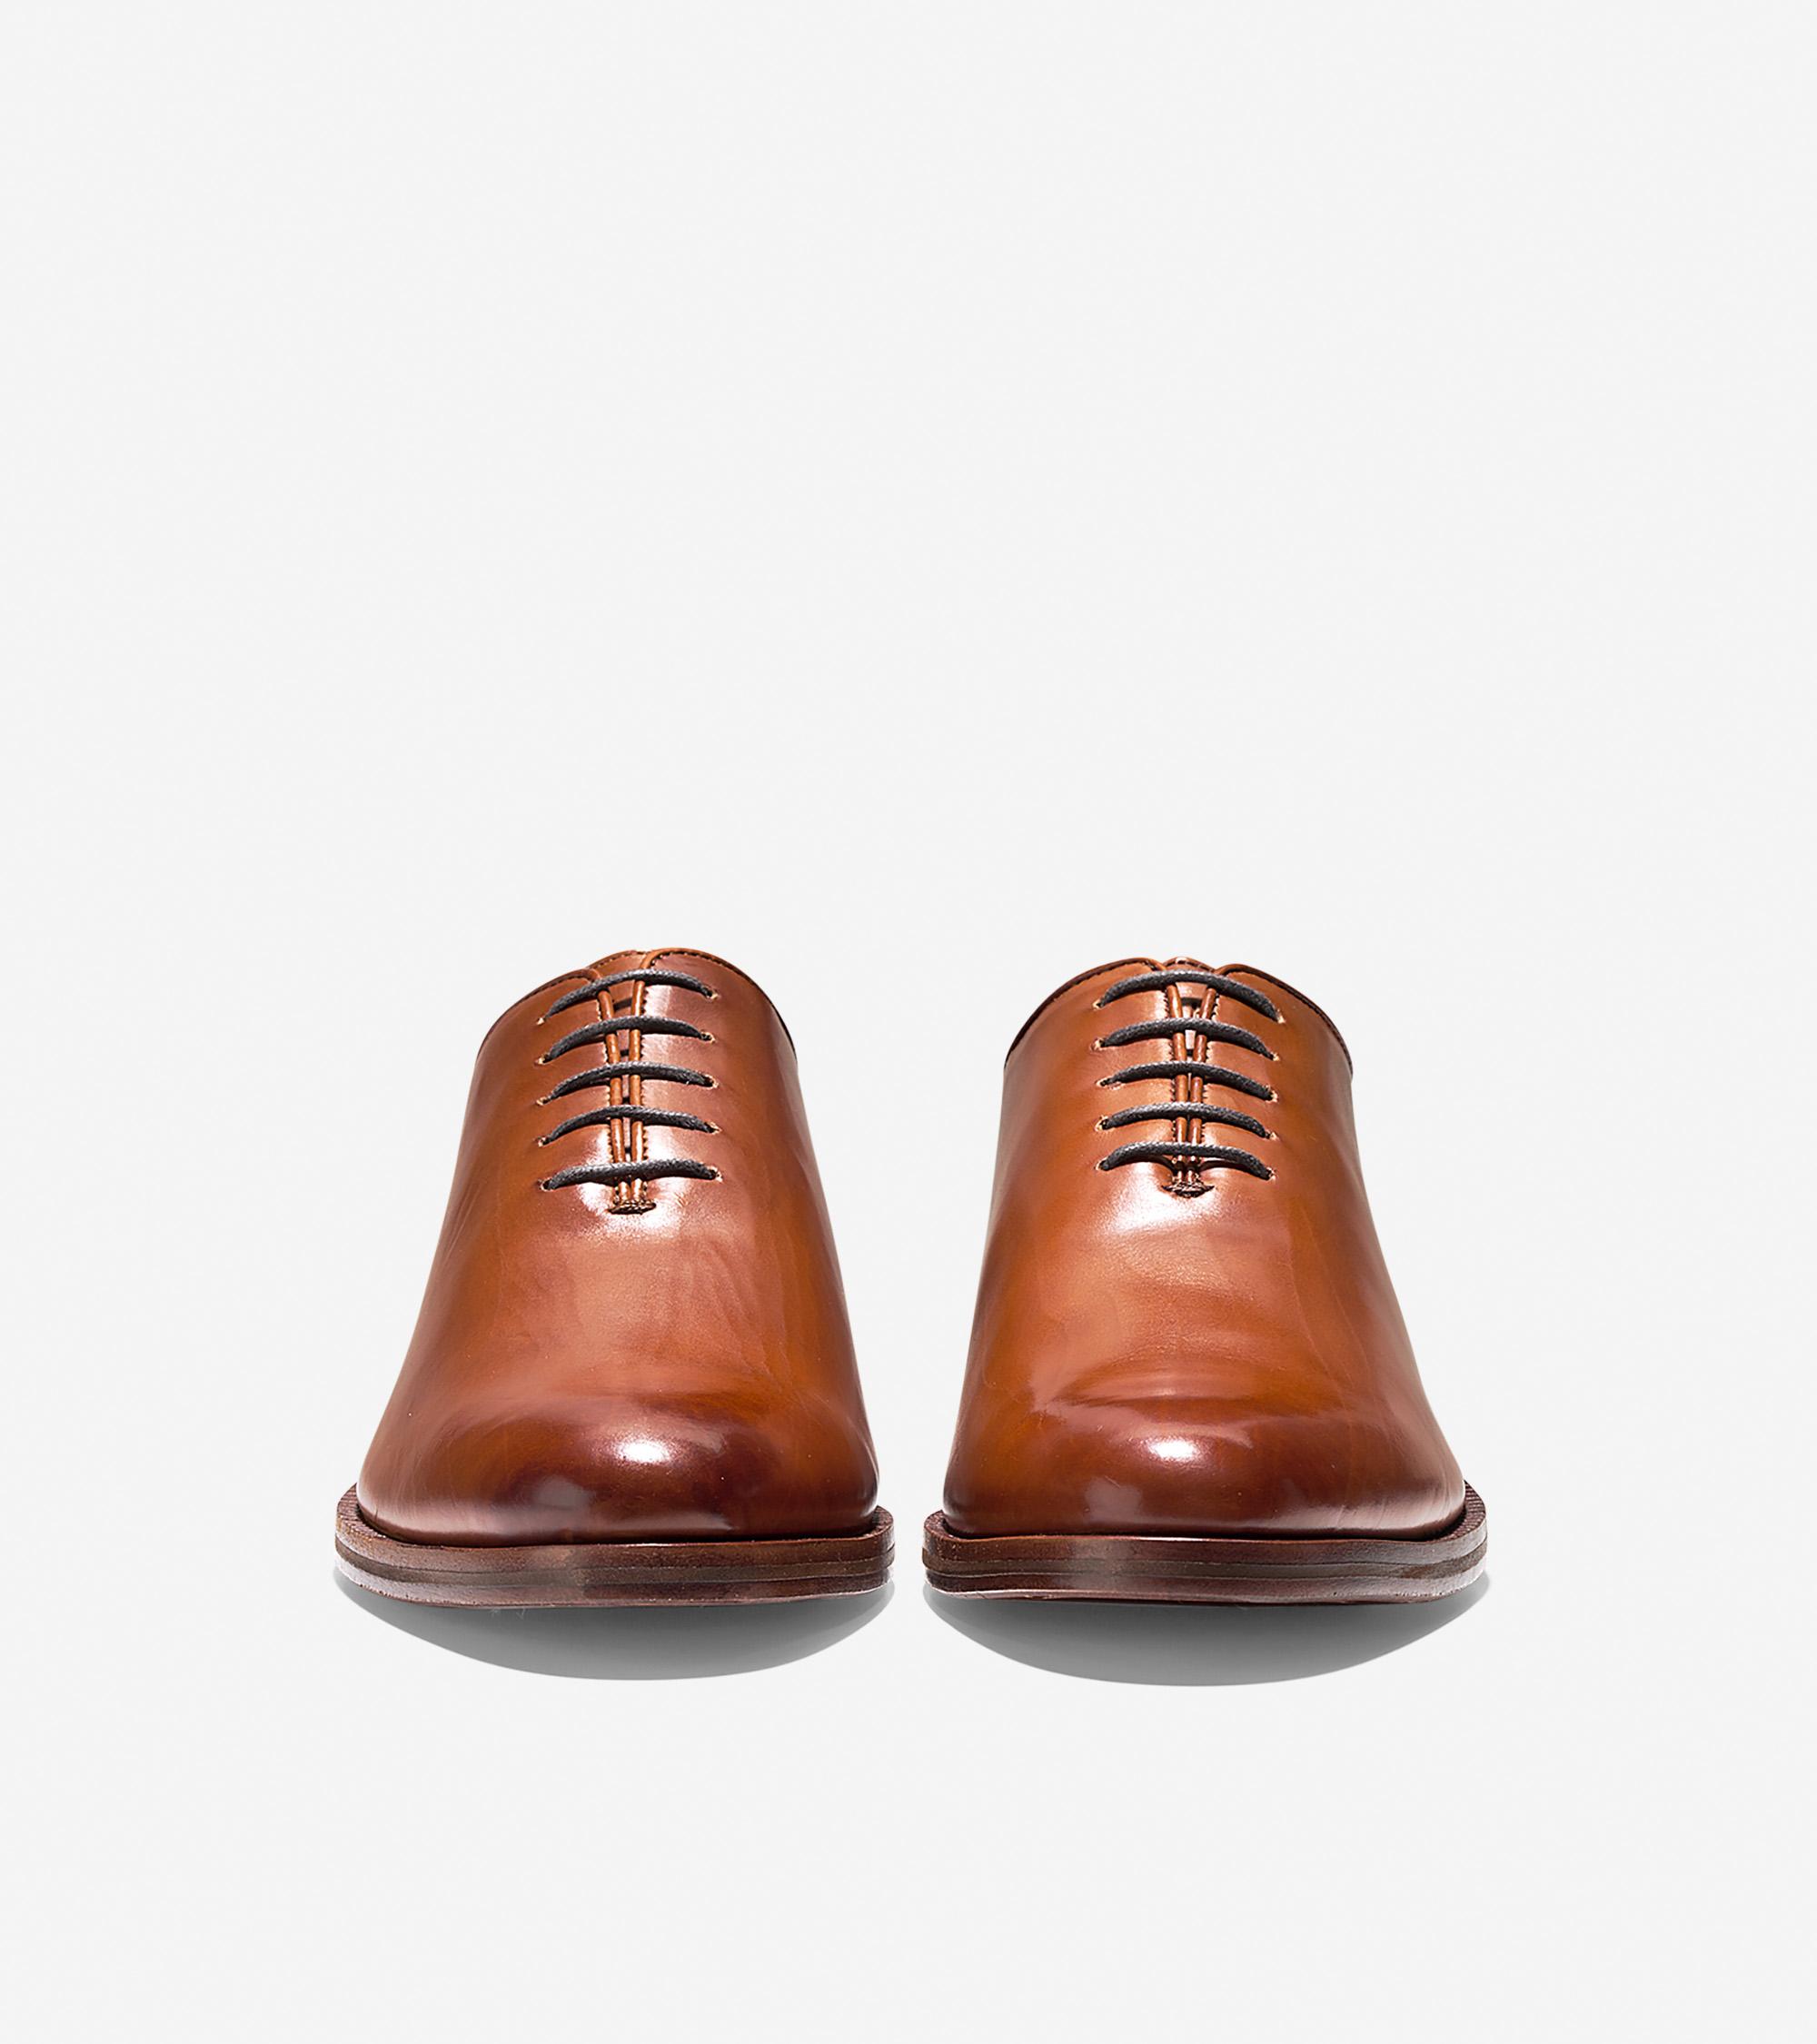 Men's Washington Grand Wholecut Oxford in British Tan Leather | Cole